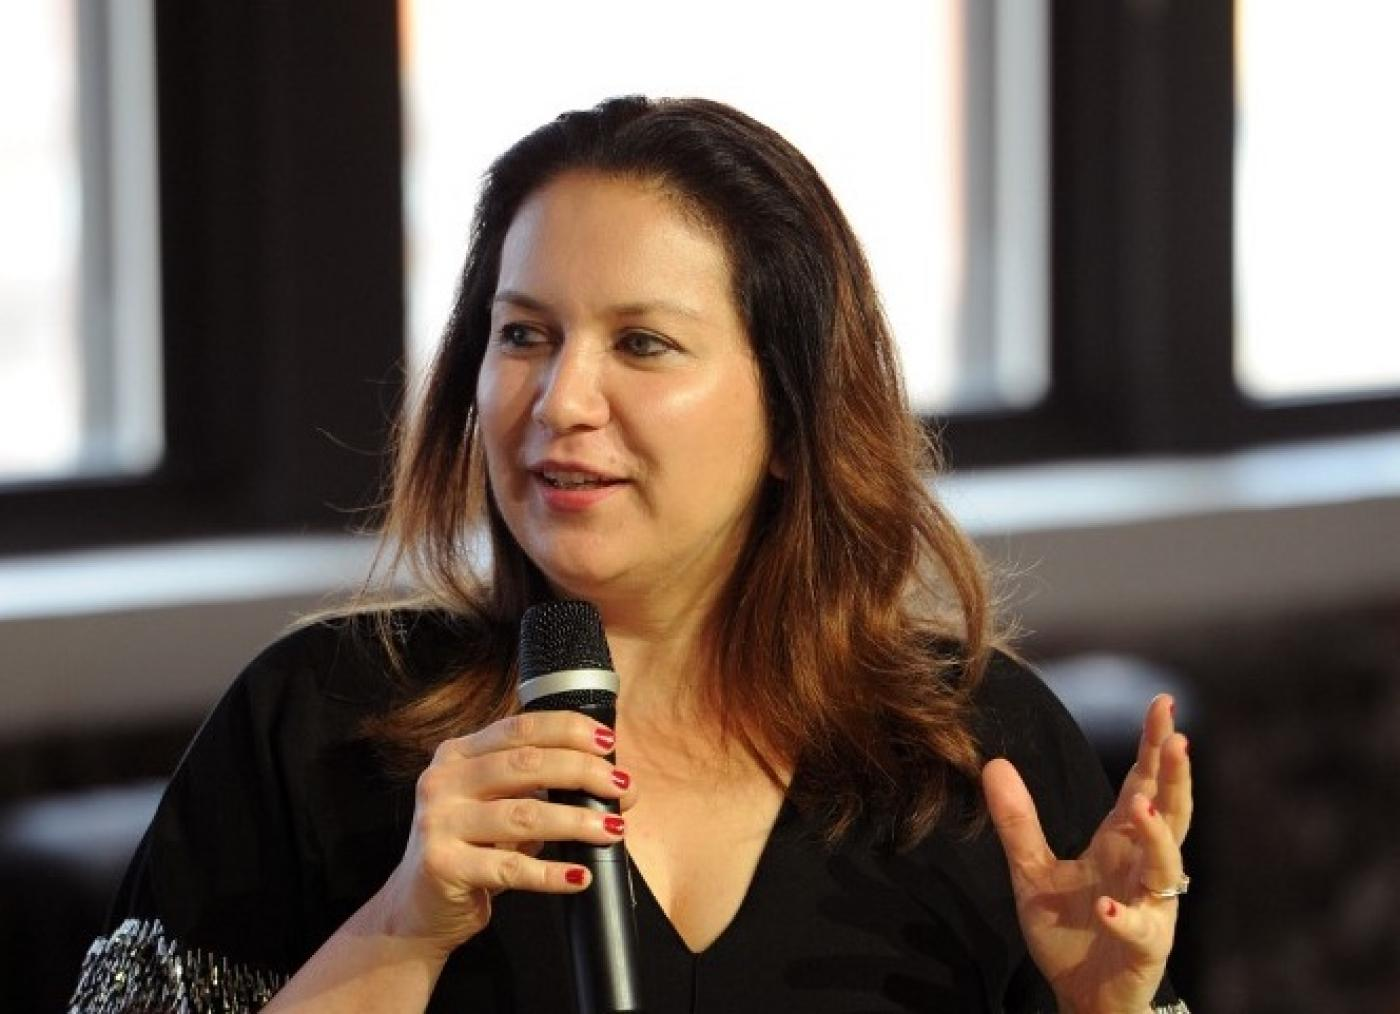 Times reporter Rukmini Callimachi speaks in New York in August 2018 (AFP)